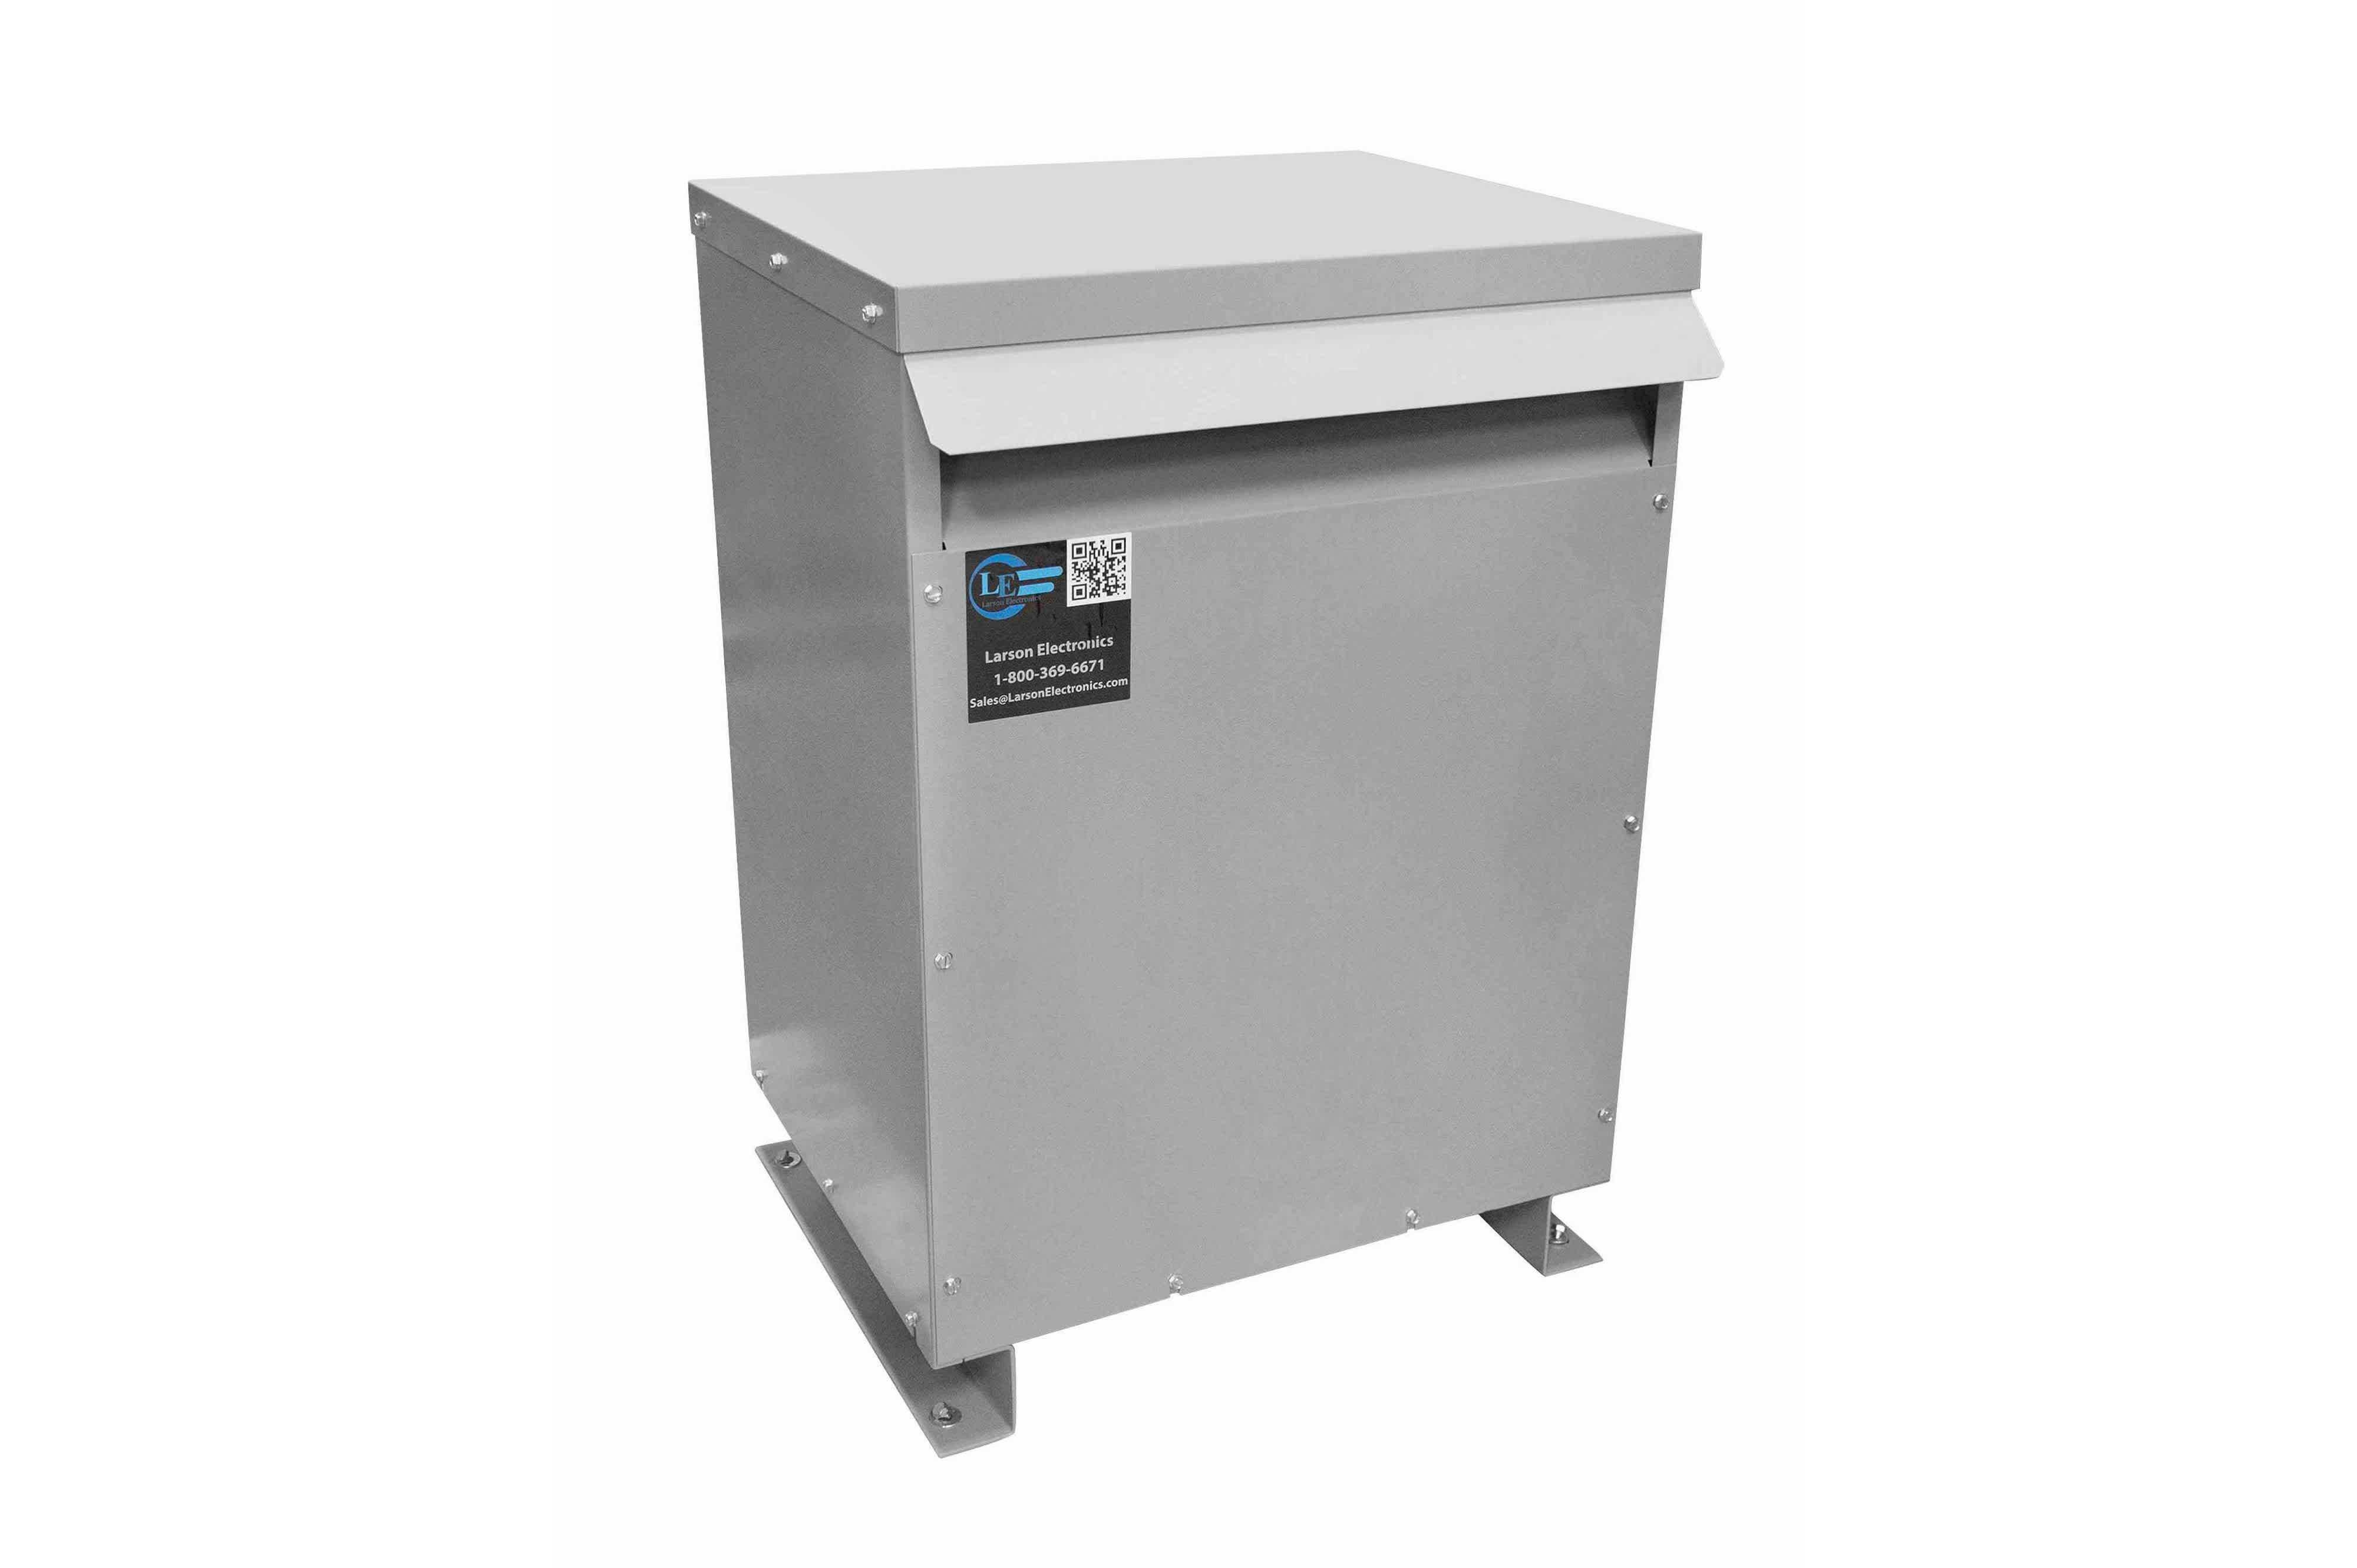 55 kVA 3PH Isolation Transformer, 240V Wye Primary, 208V Delta Secondary, N3R, Ventilated, 60 Hz